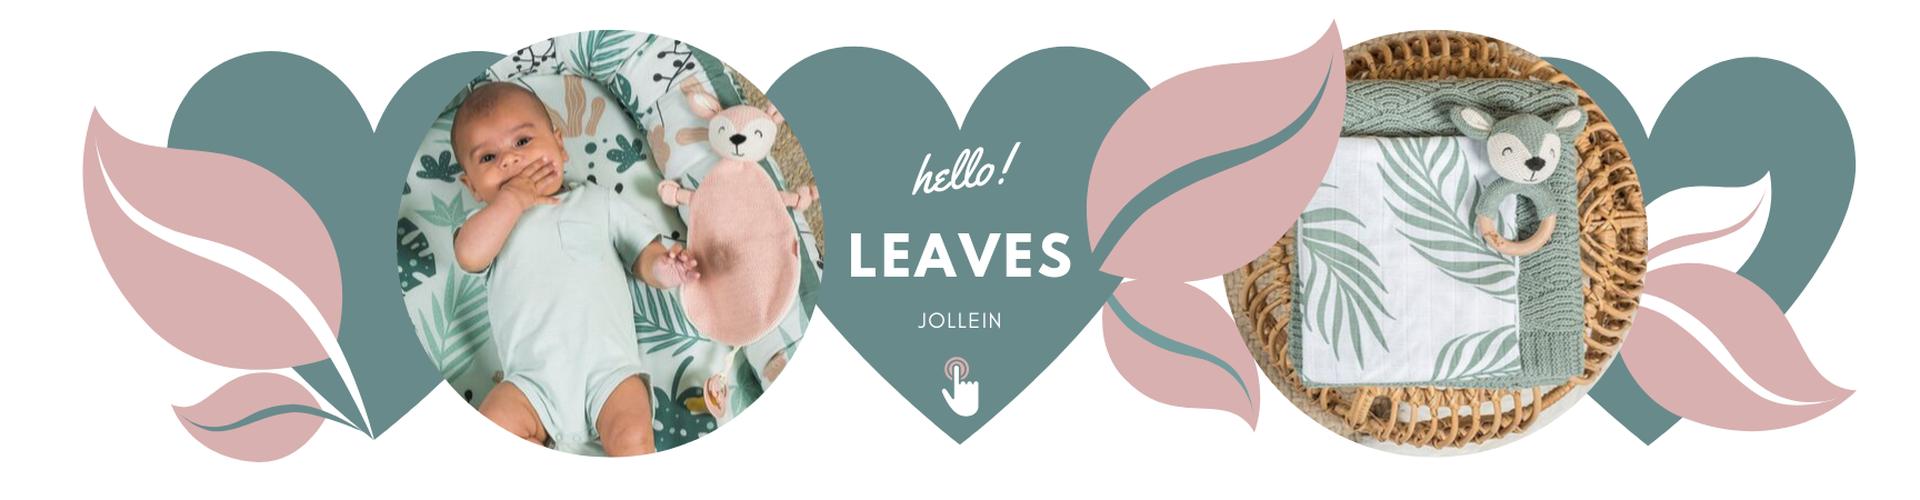 Jollein leaves